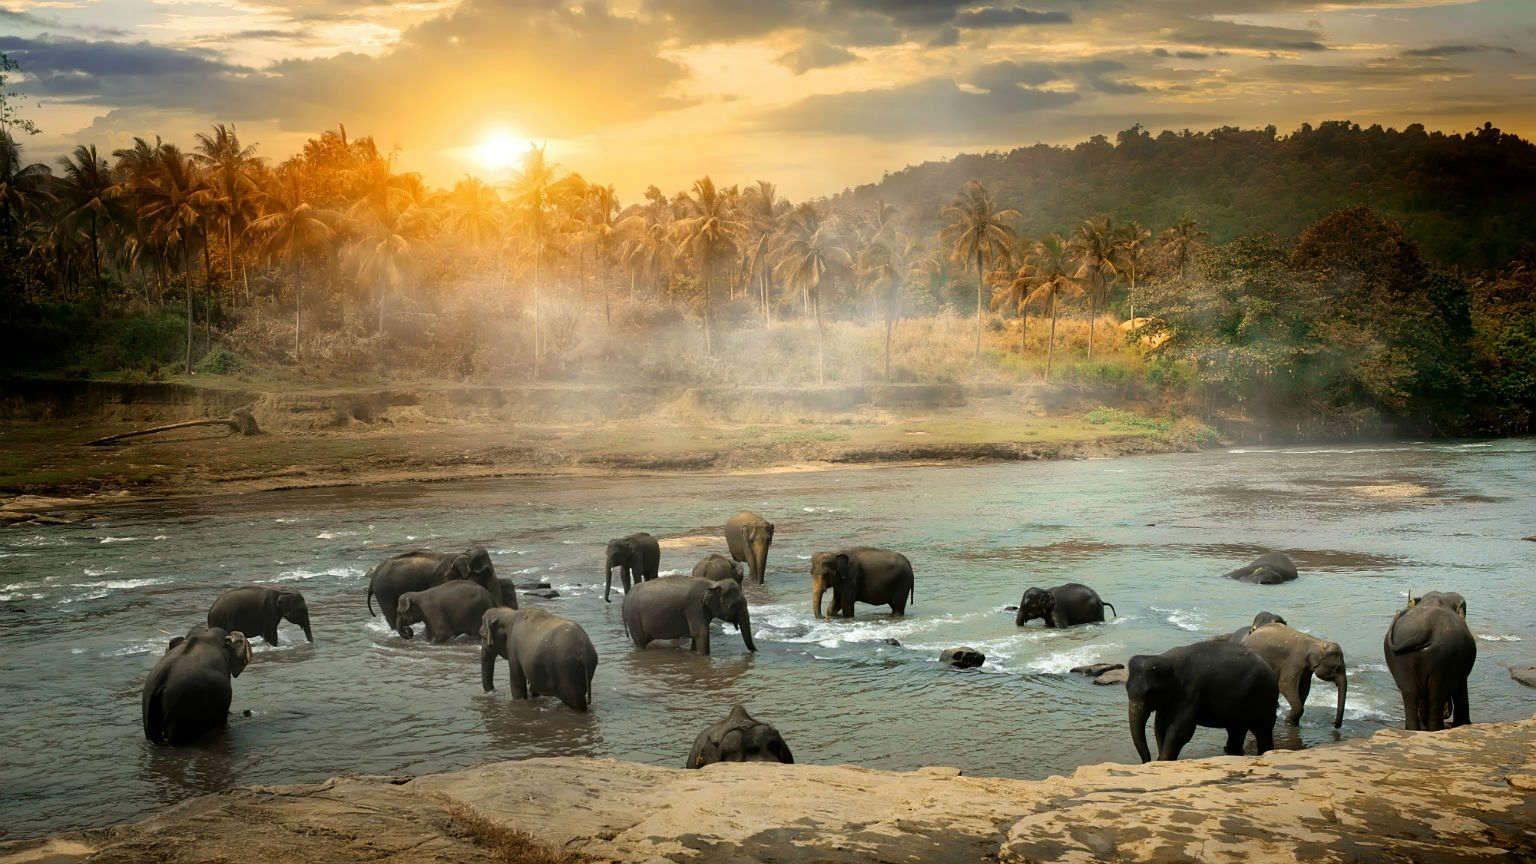 Elephants in the jungle Sri Lanka